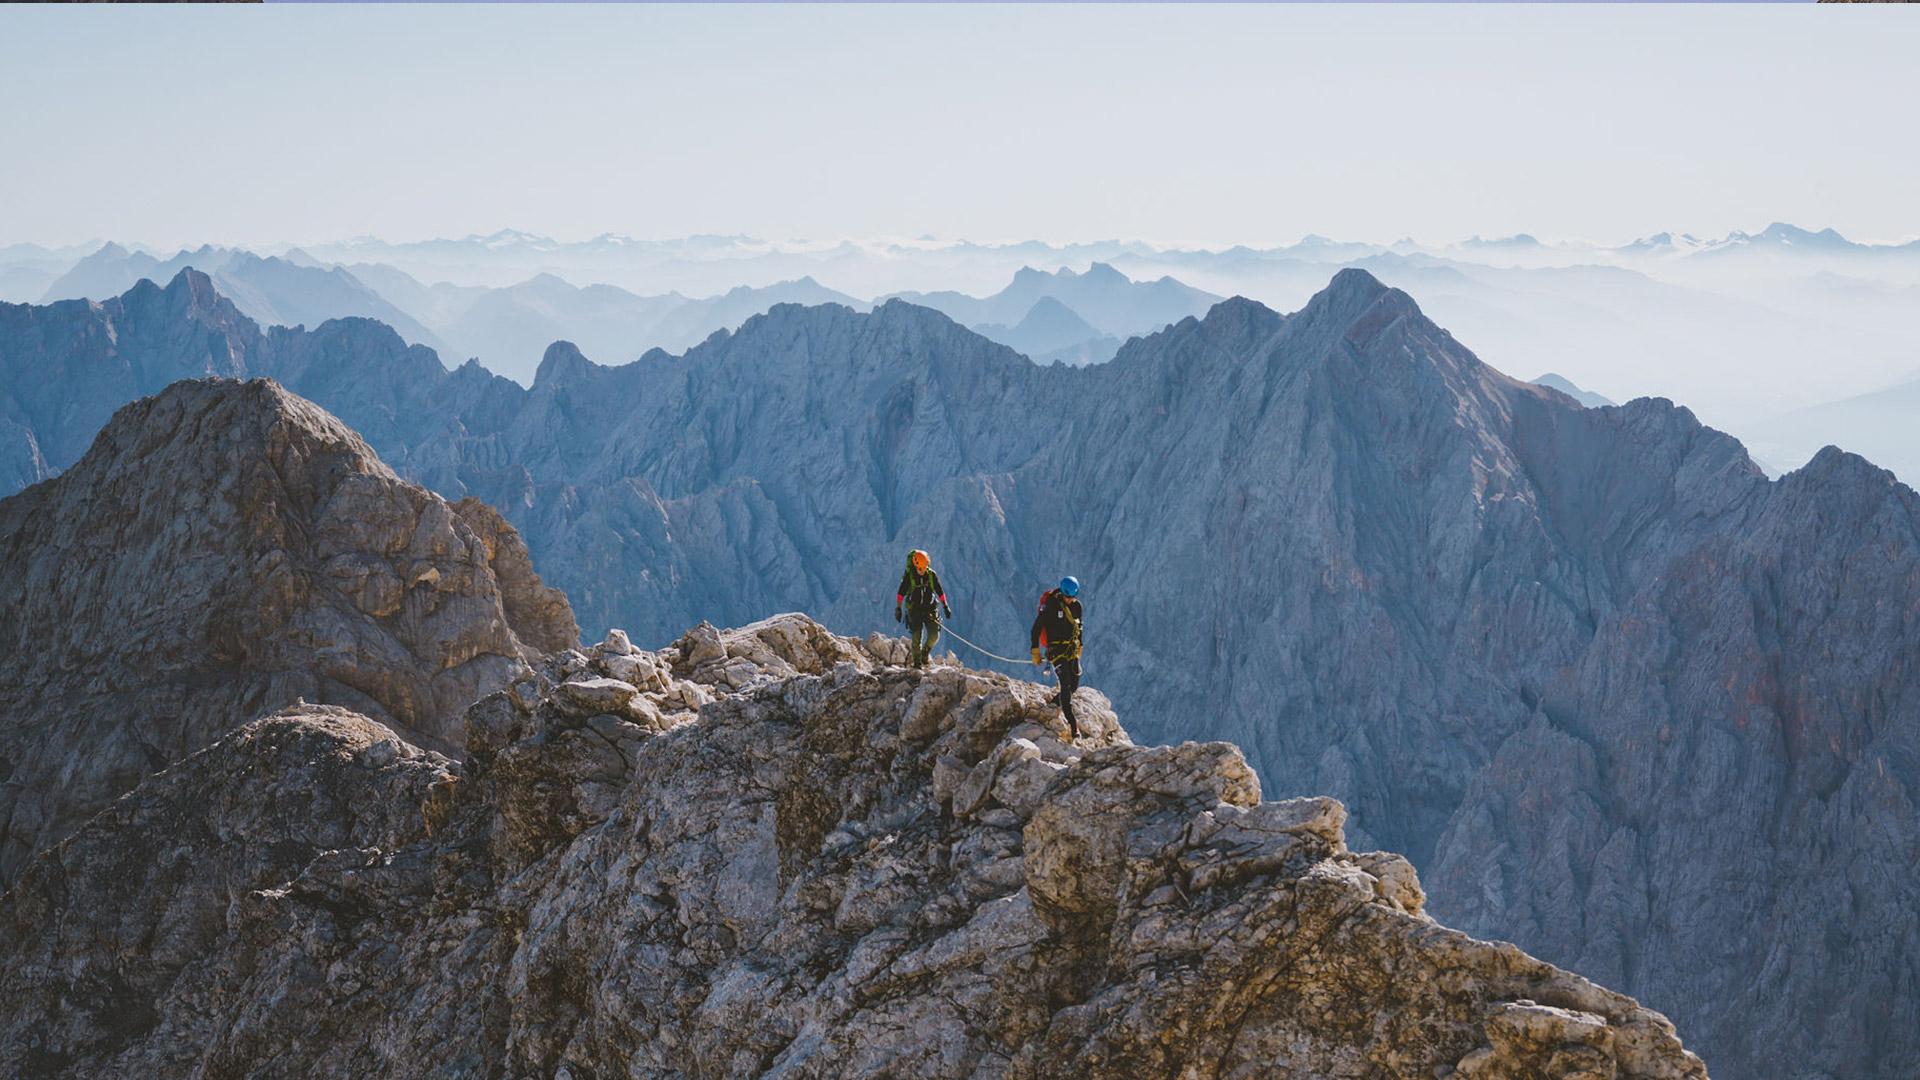 Hanwag Alpine Experience